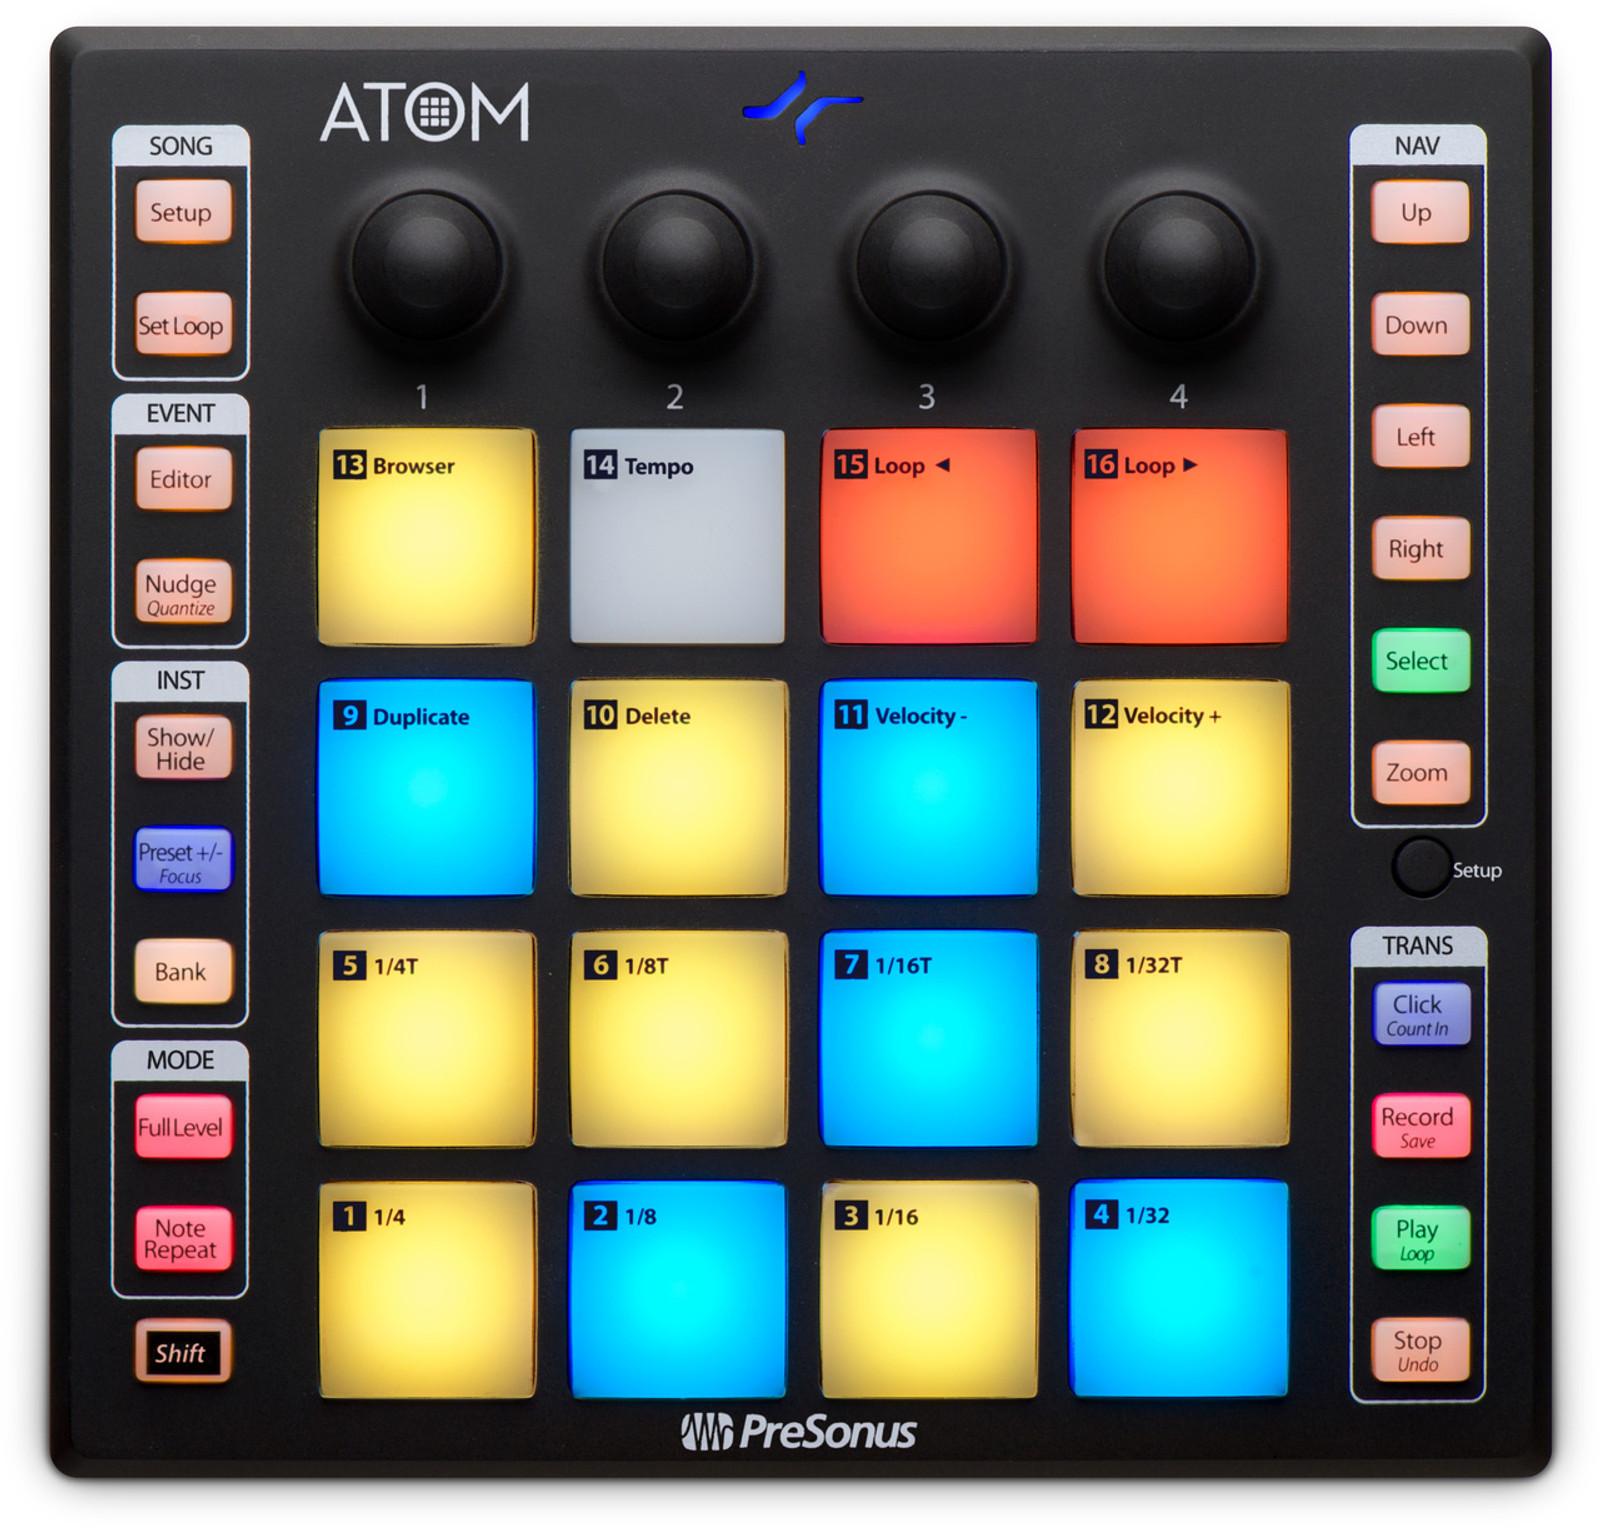 ATOM Pad Controller